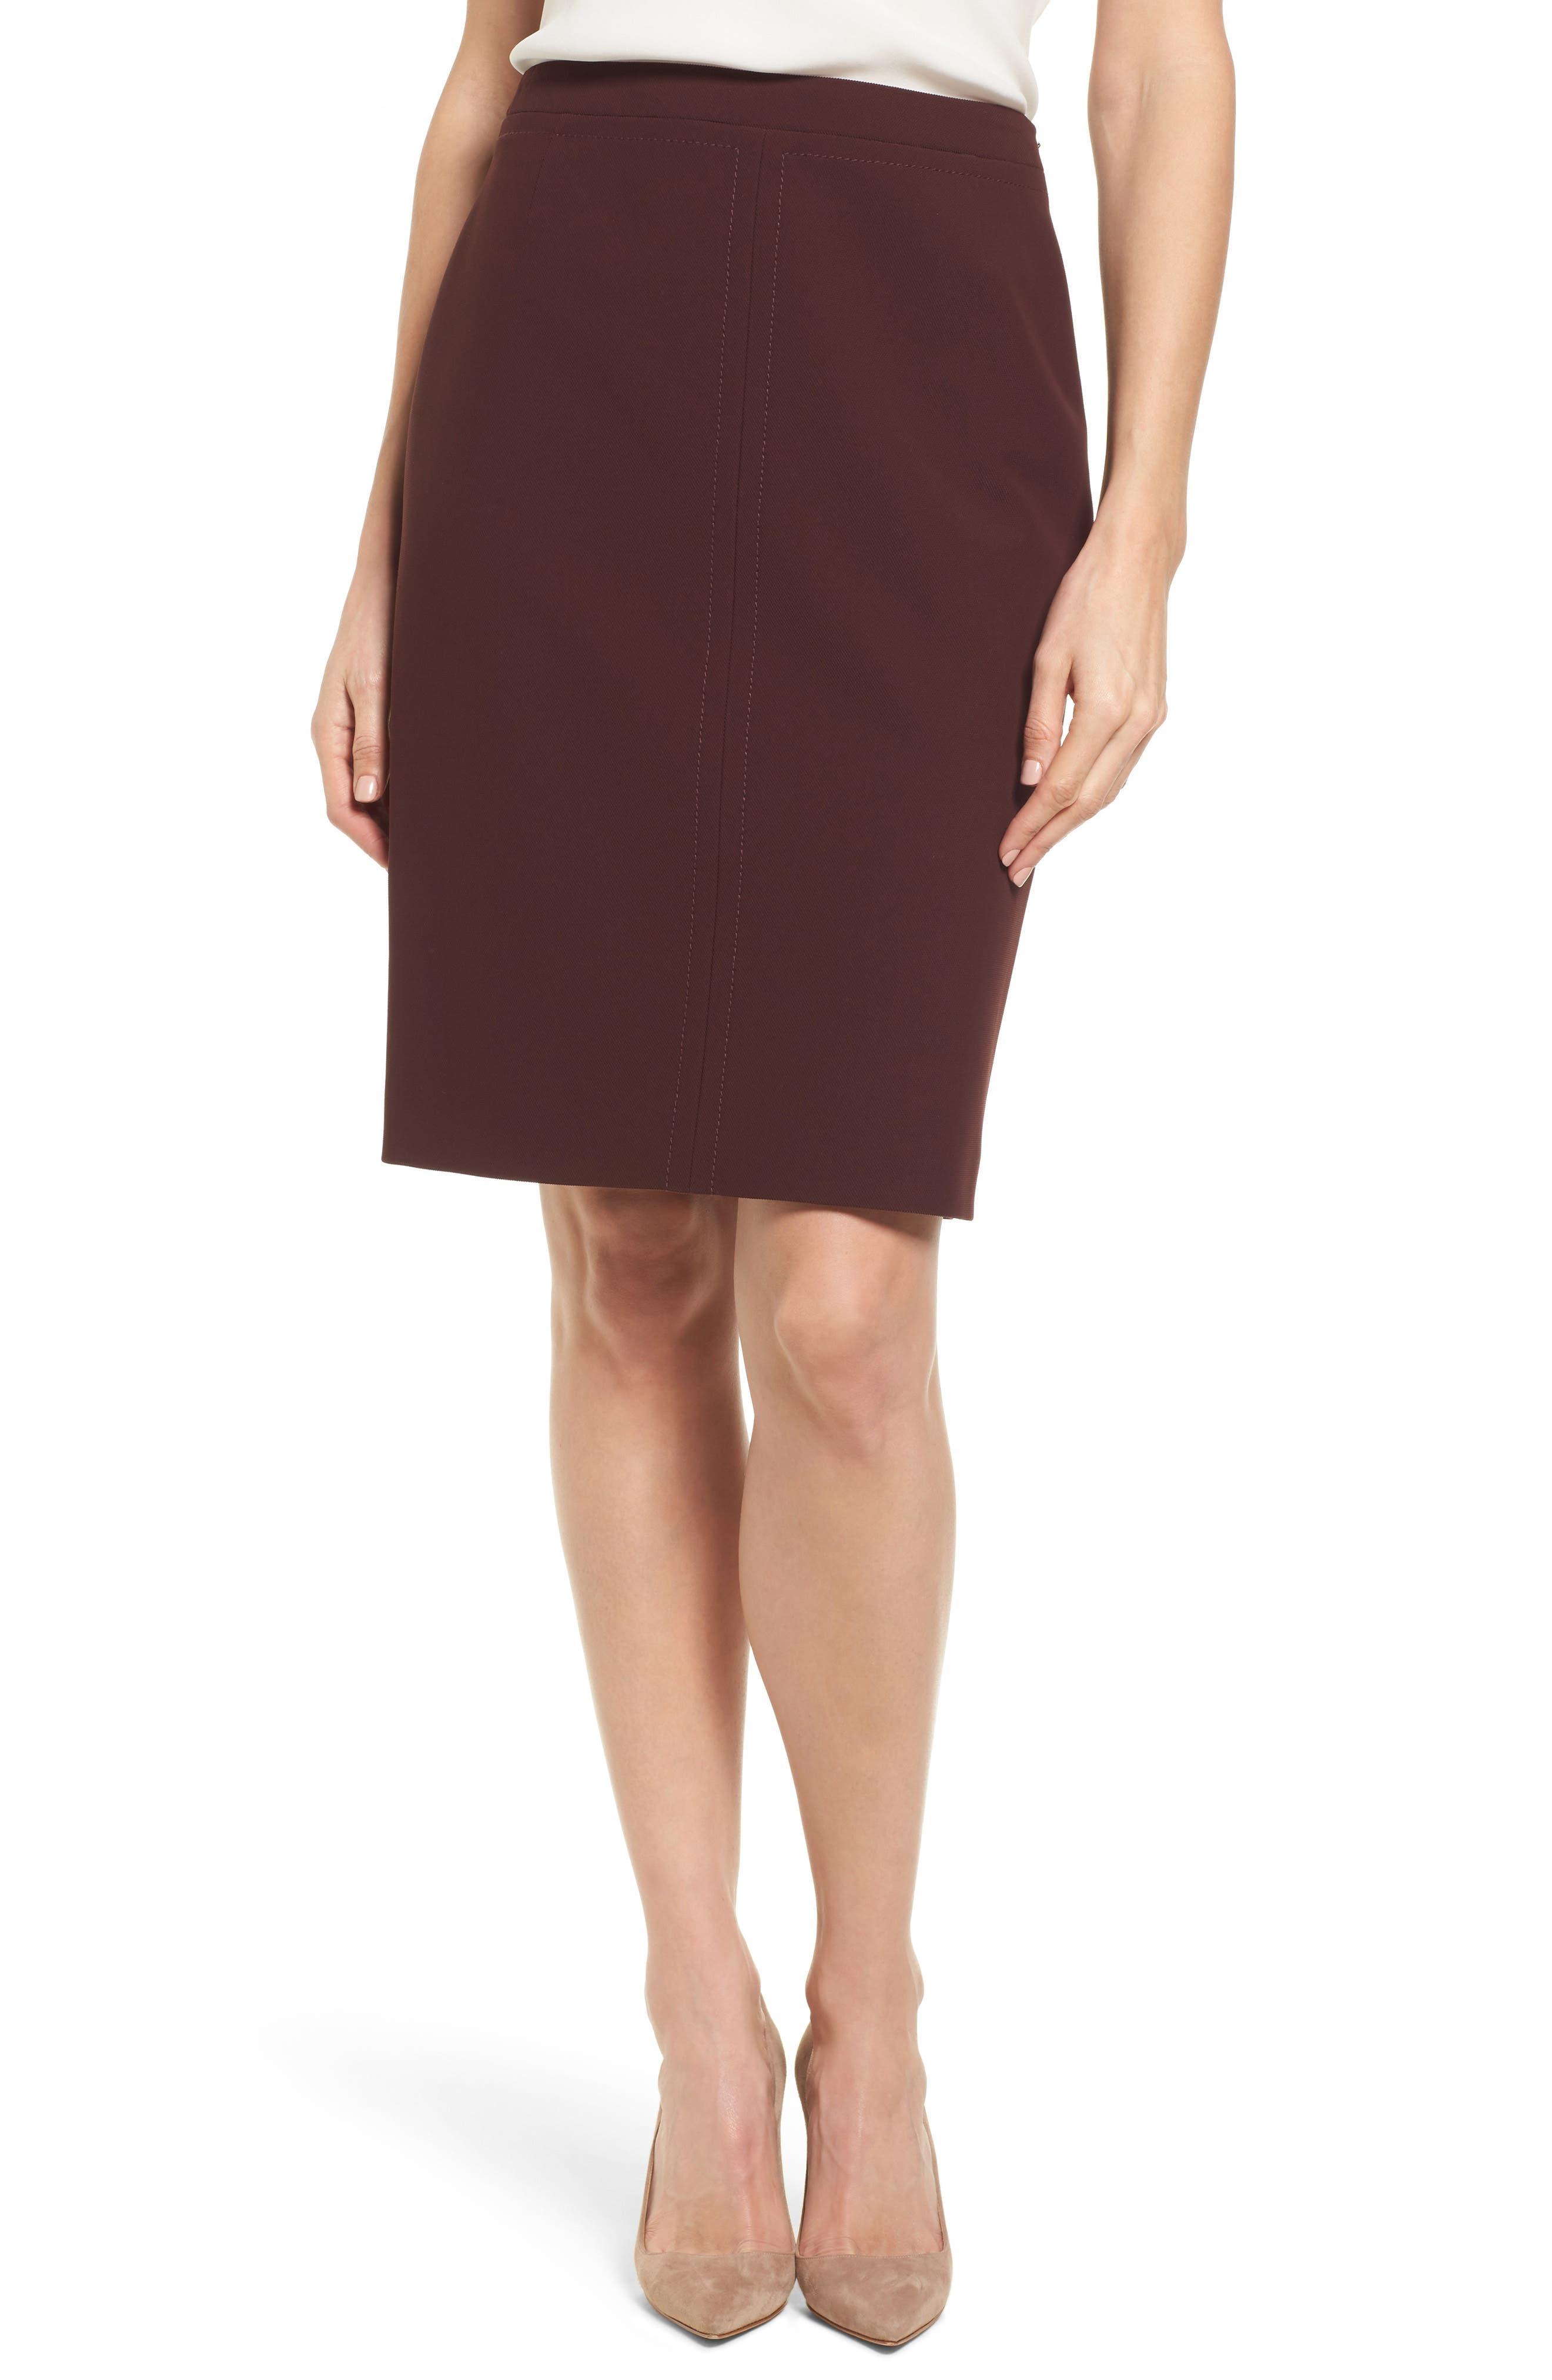 Vuriona Suit Skirt,                             Main thumbnail 1, color,                             Mulberry